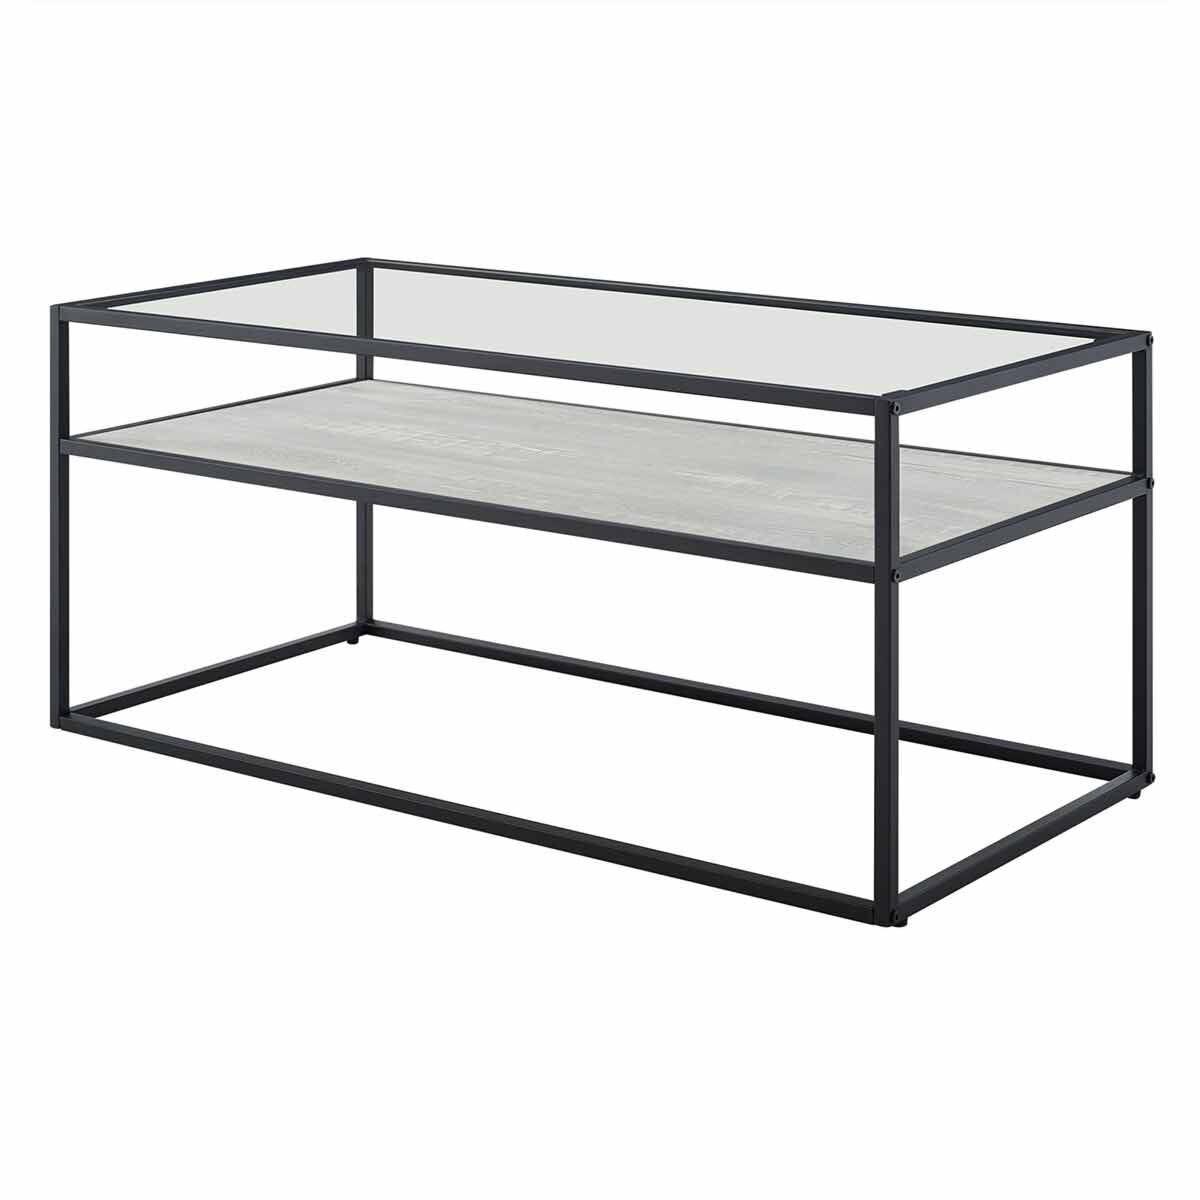 Jaen Modern Glass Coffee Table with Reversible Shelf Wood